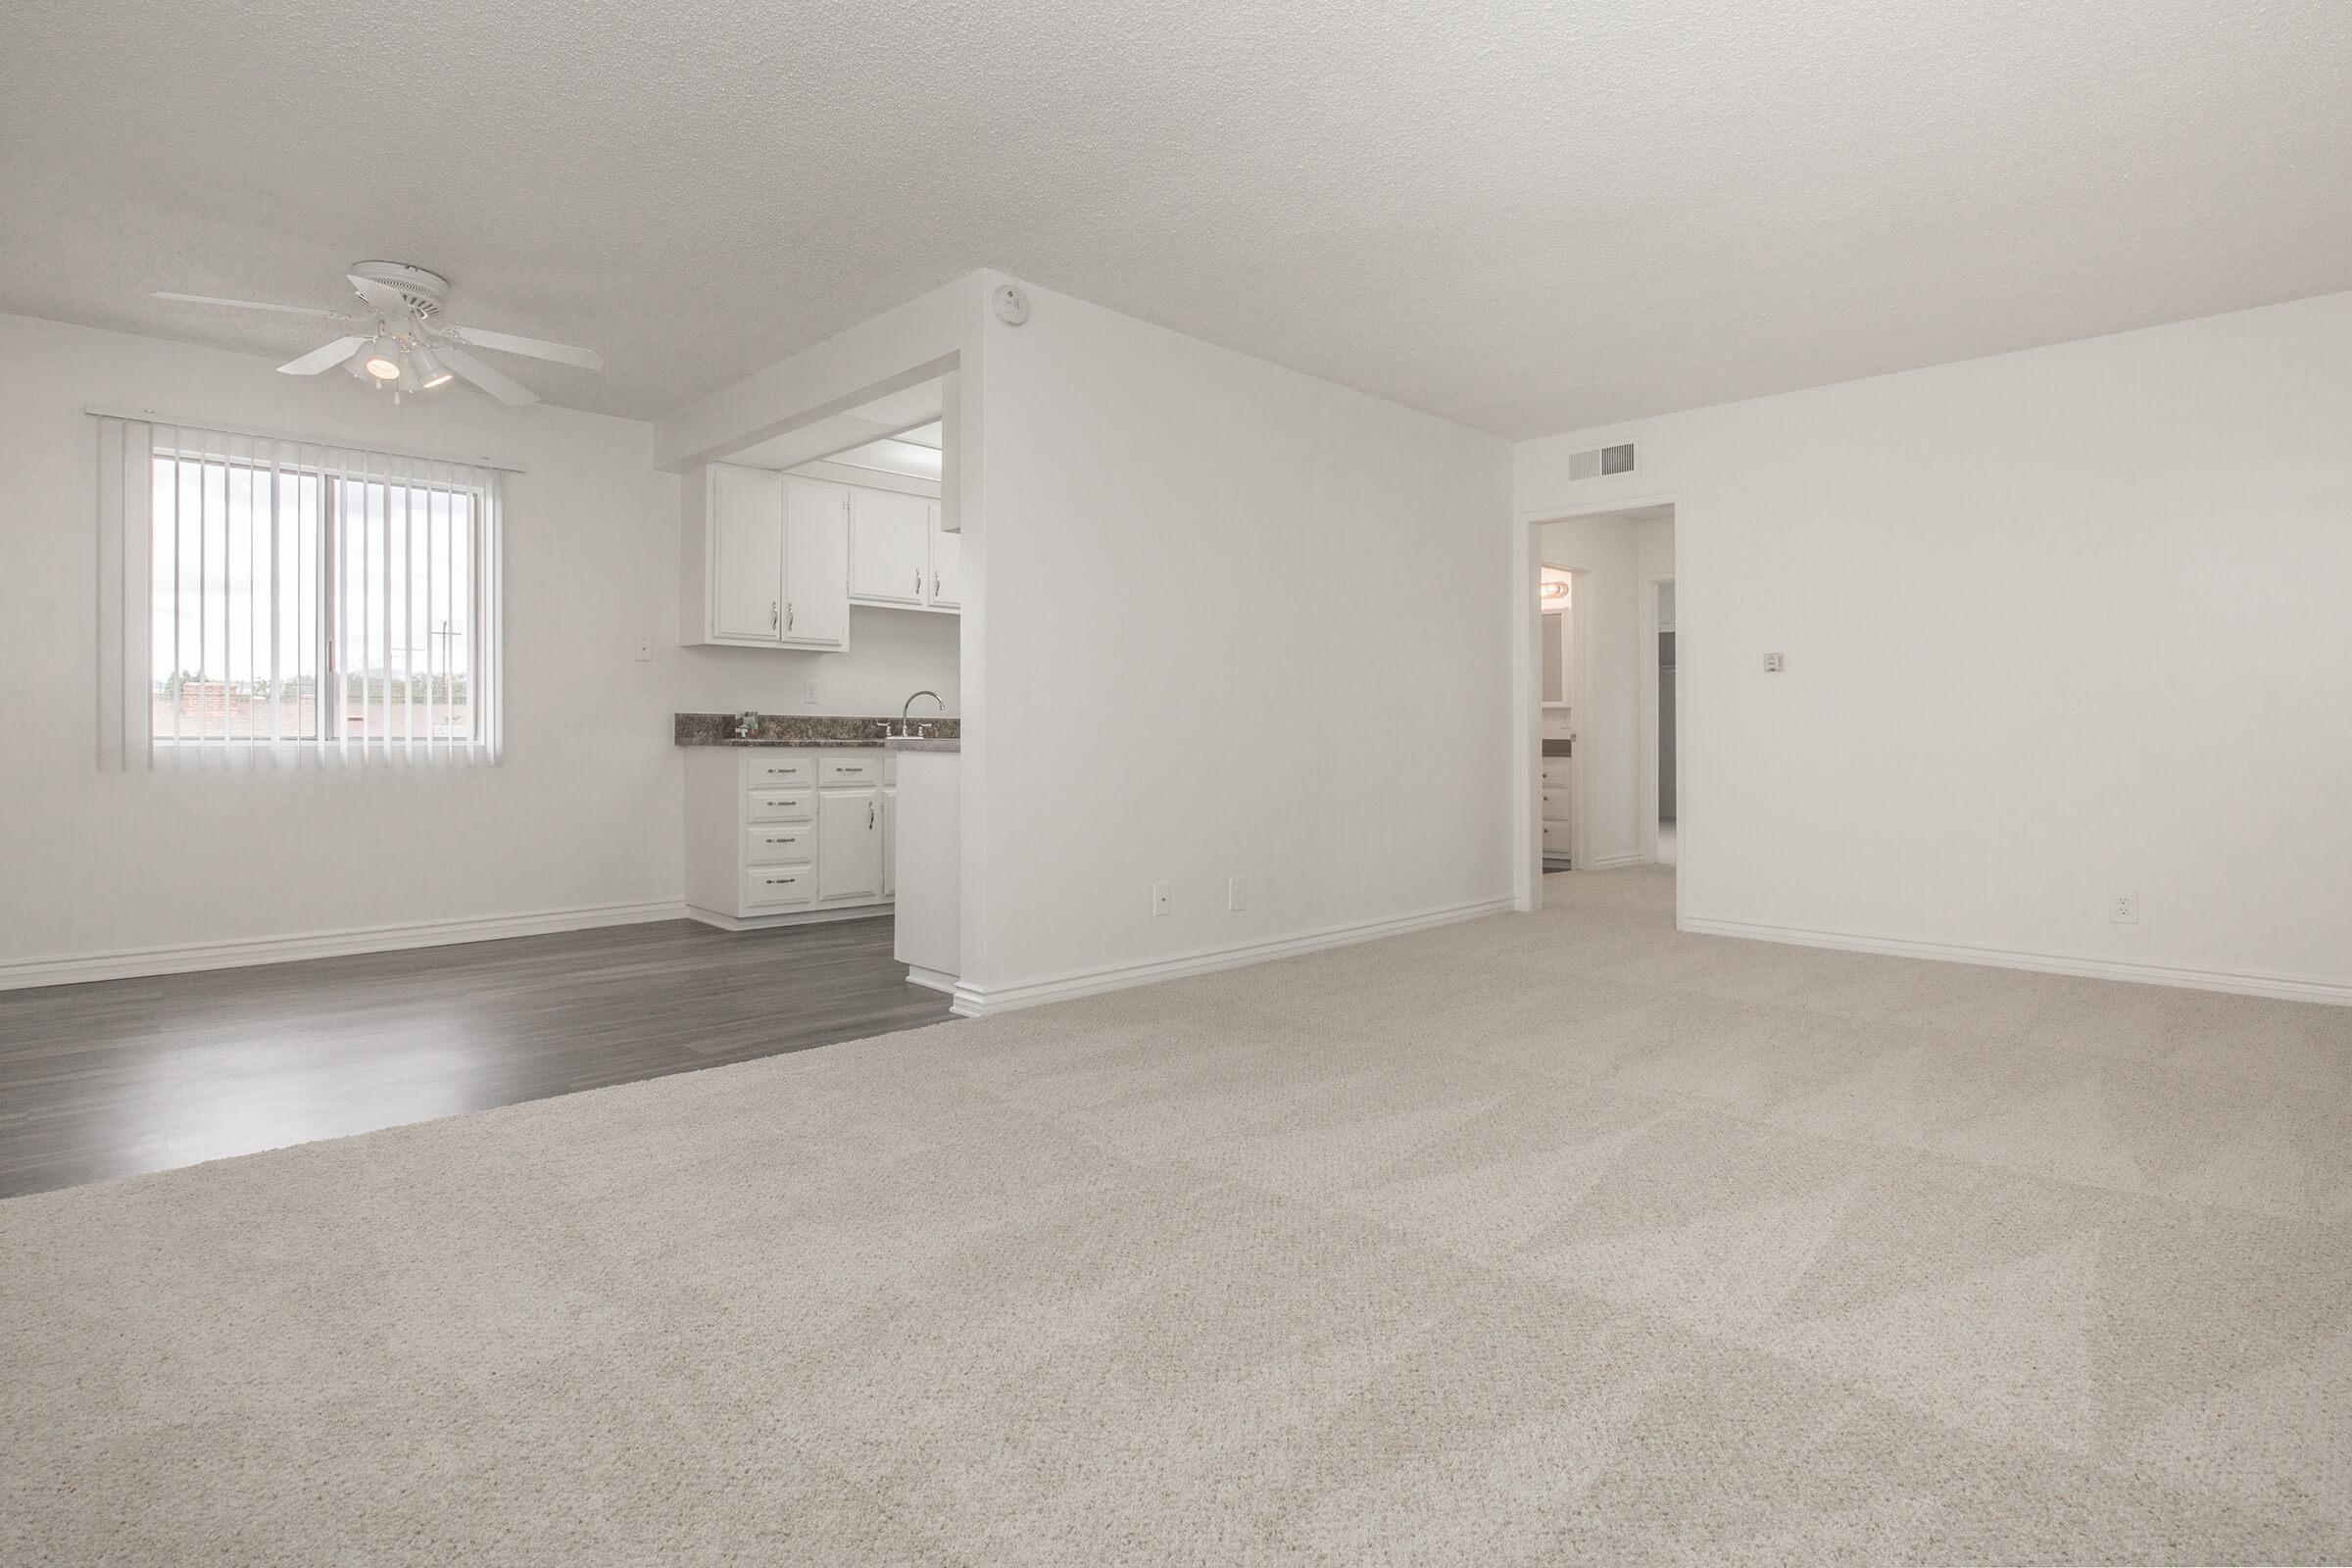 Unfurnished living room with carpet